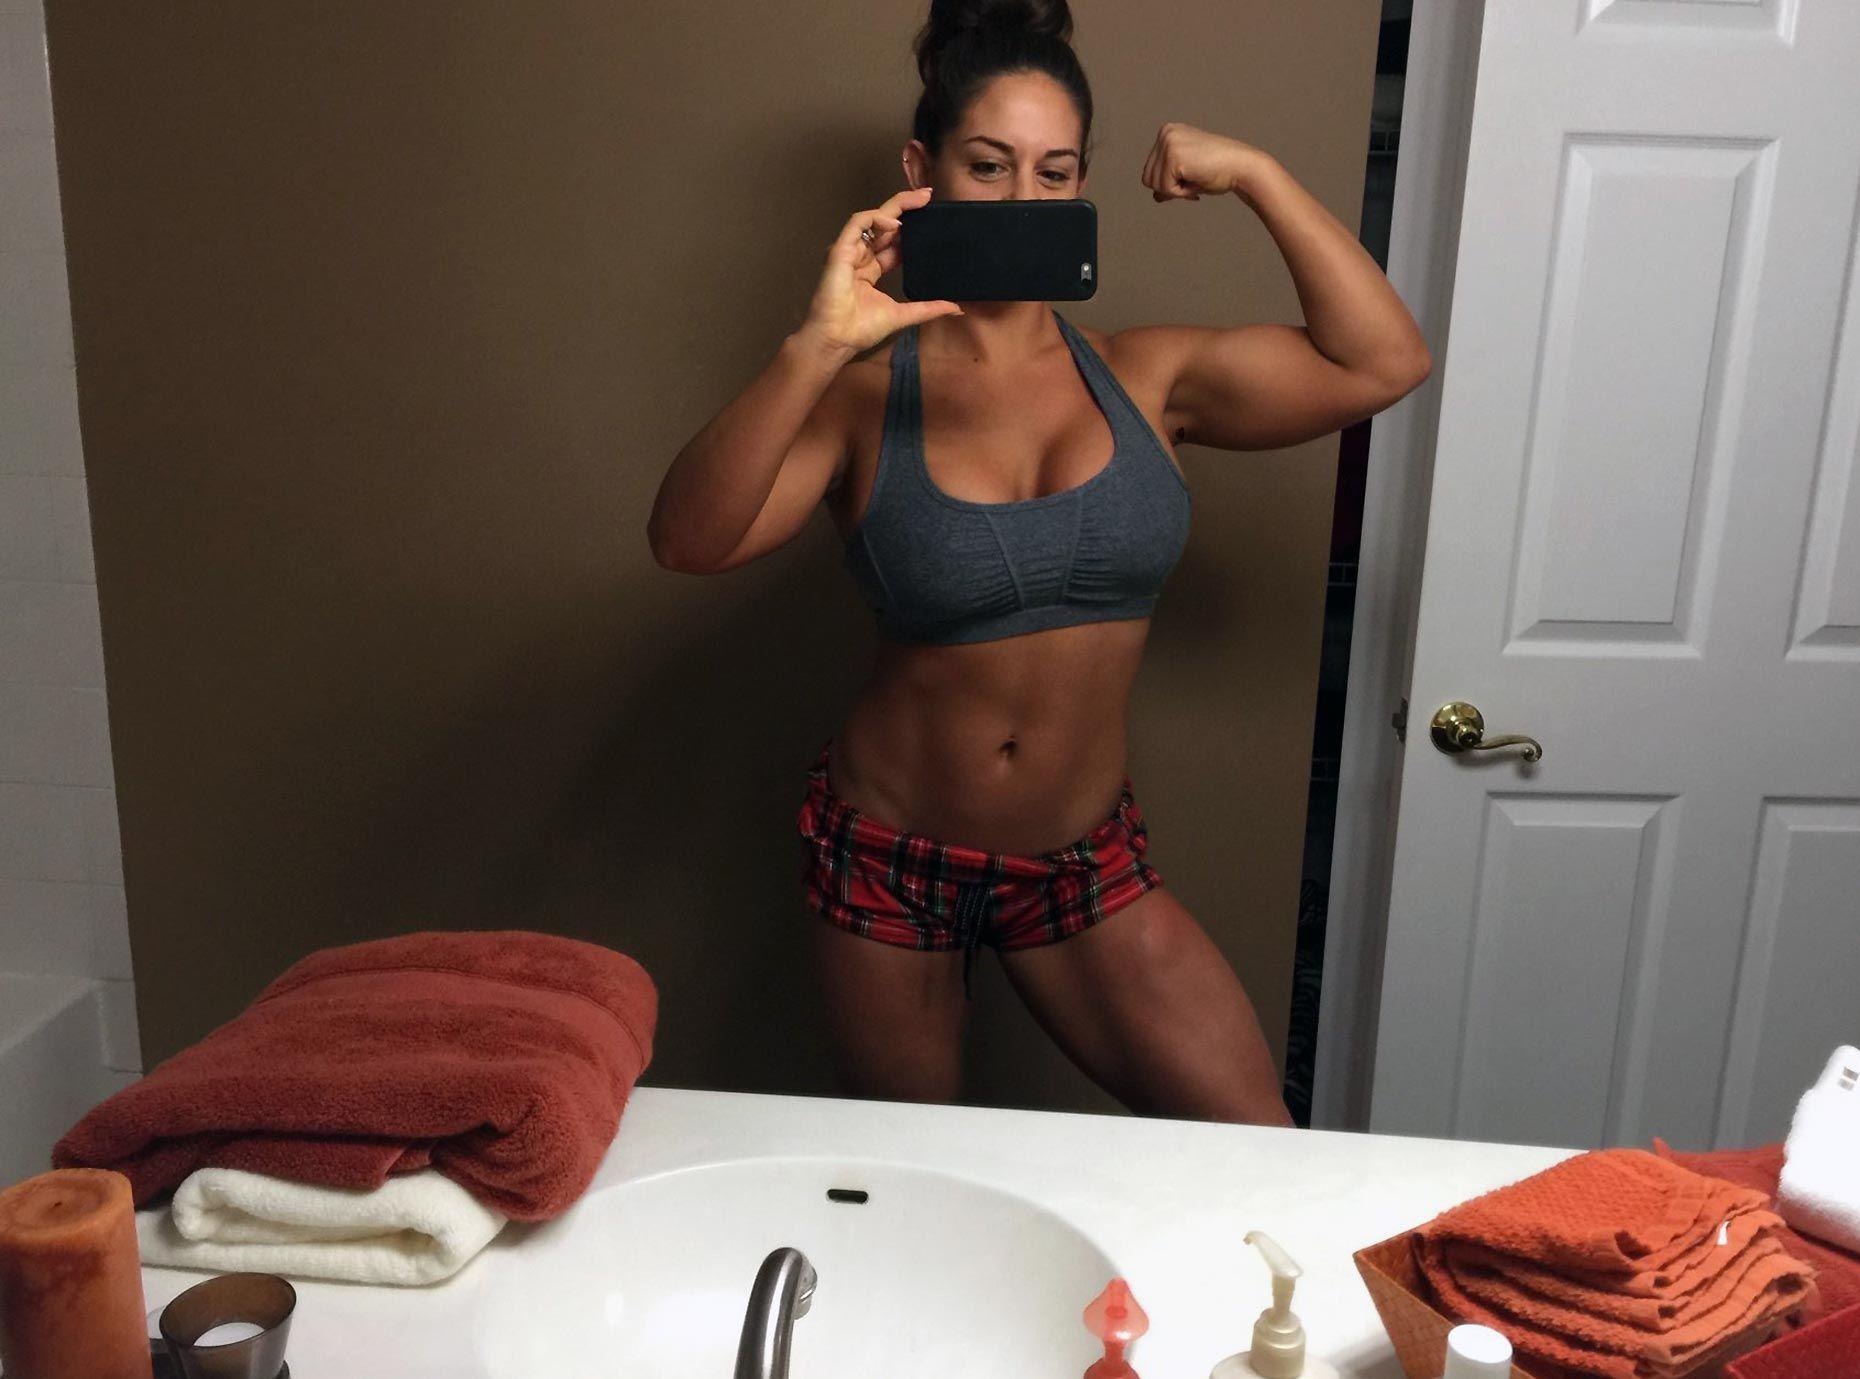 Celeste Bonin Nude Leaked The Fappening & Sexy 0292